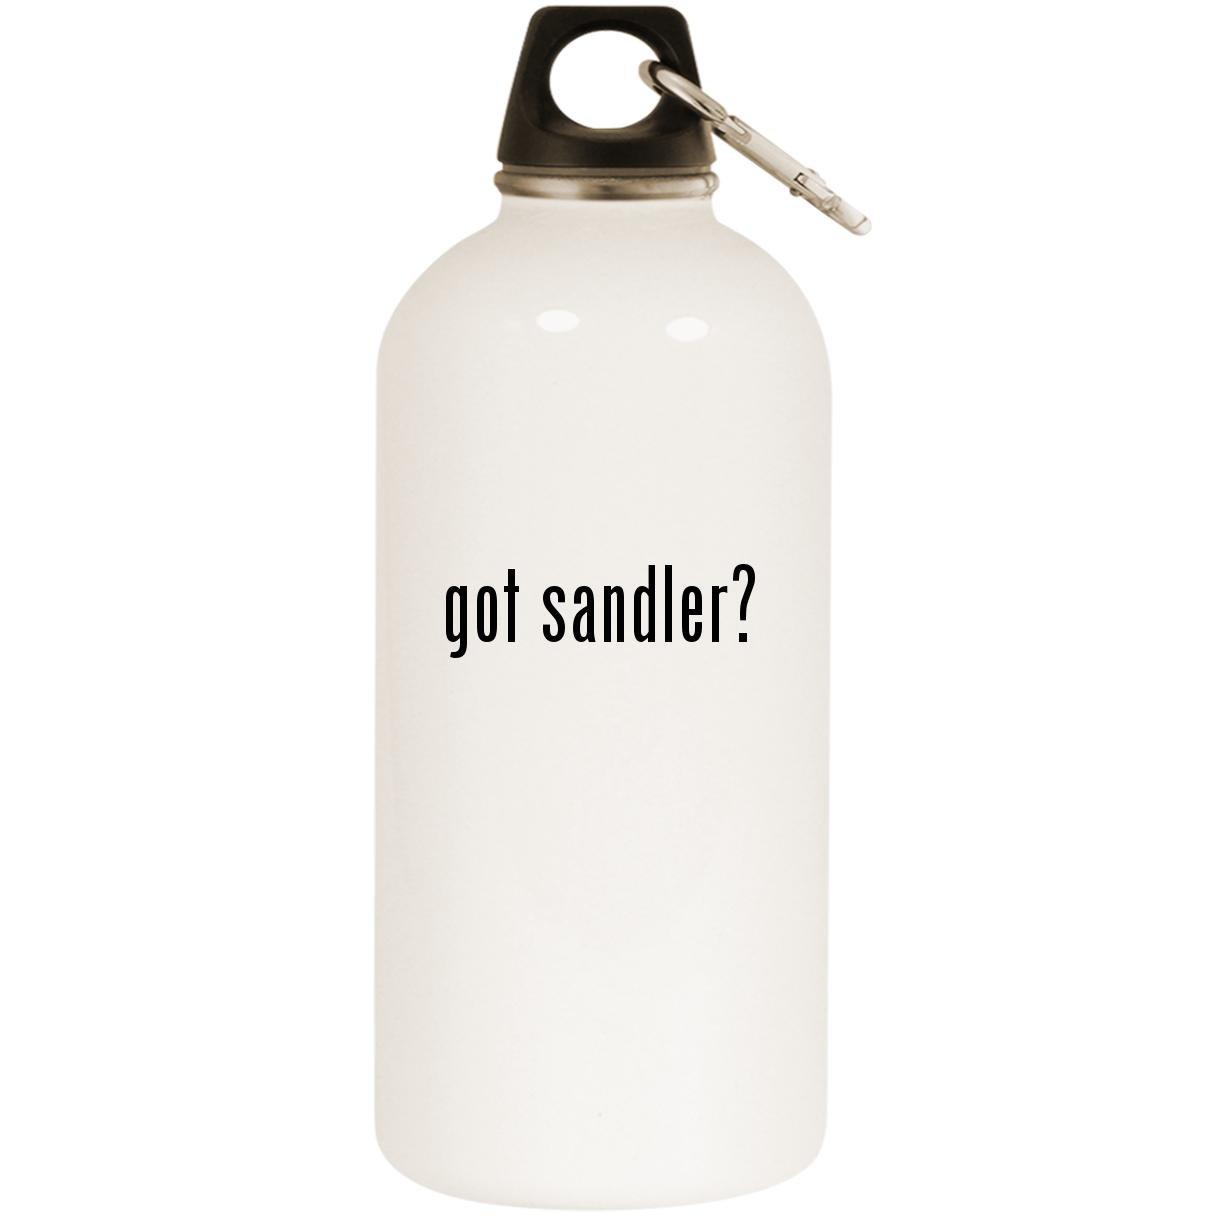 got sandler? - White 20oz Stainless Steel Water Bottle with Carabiner